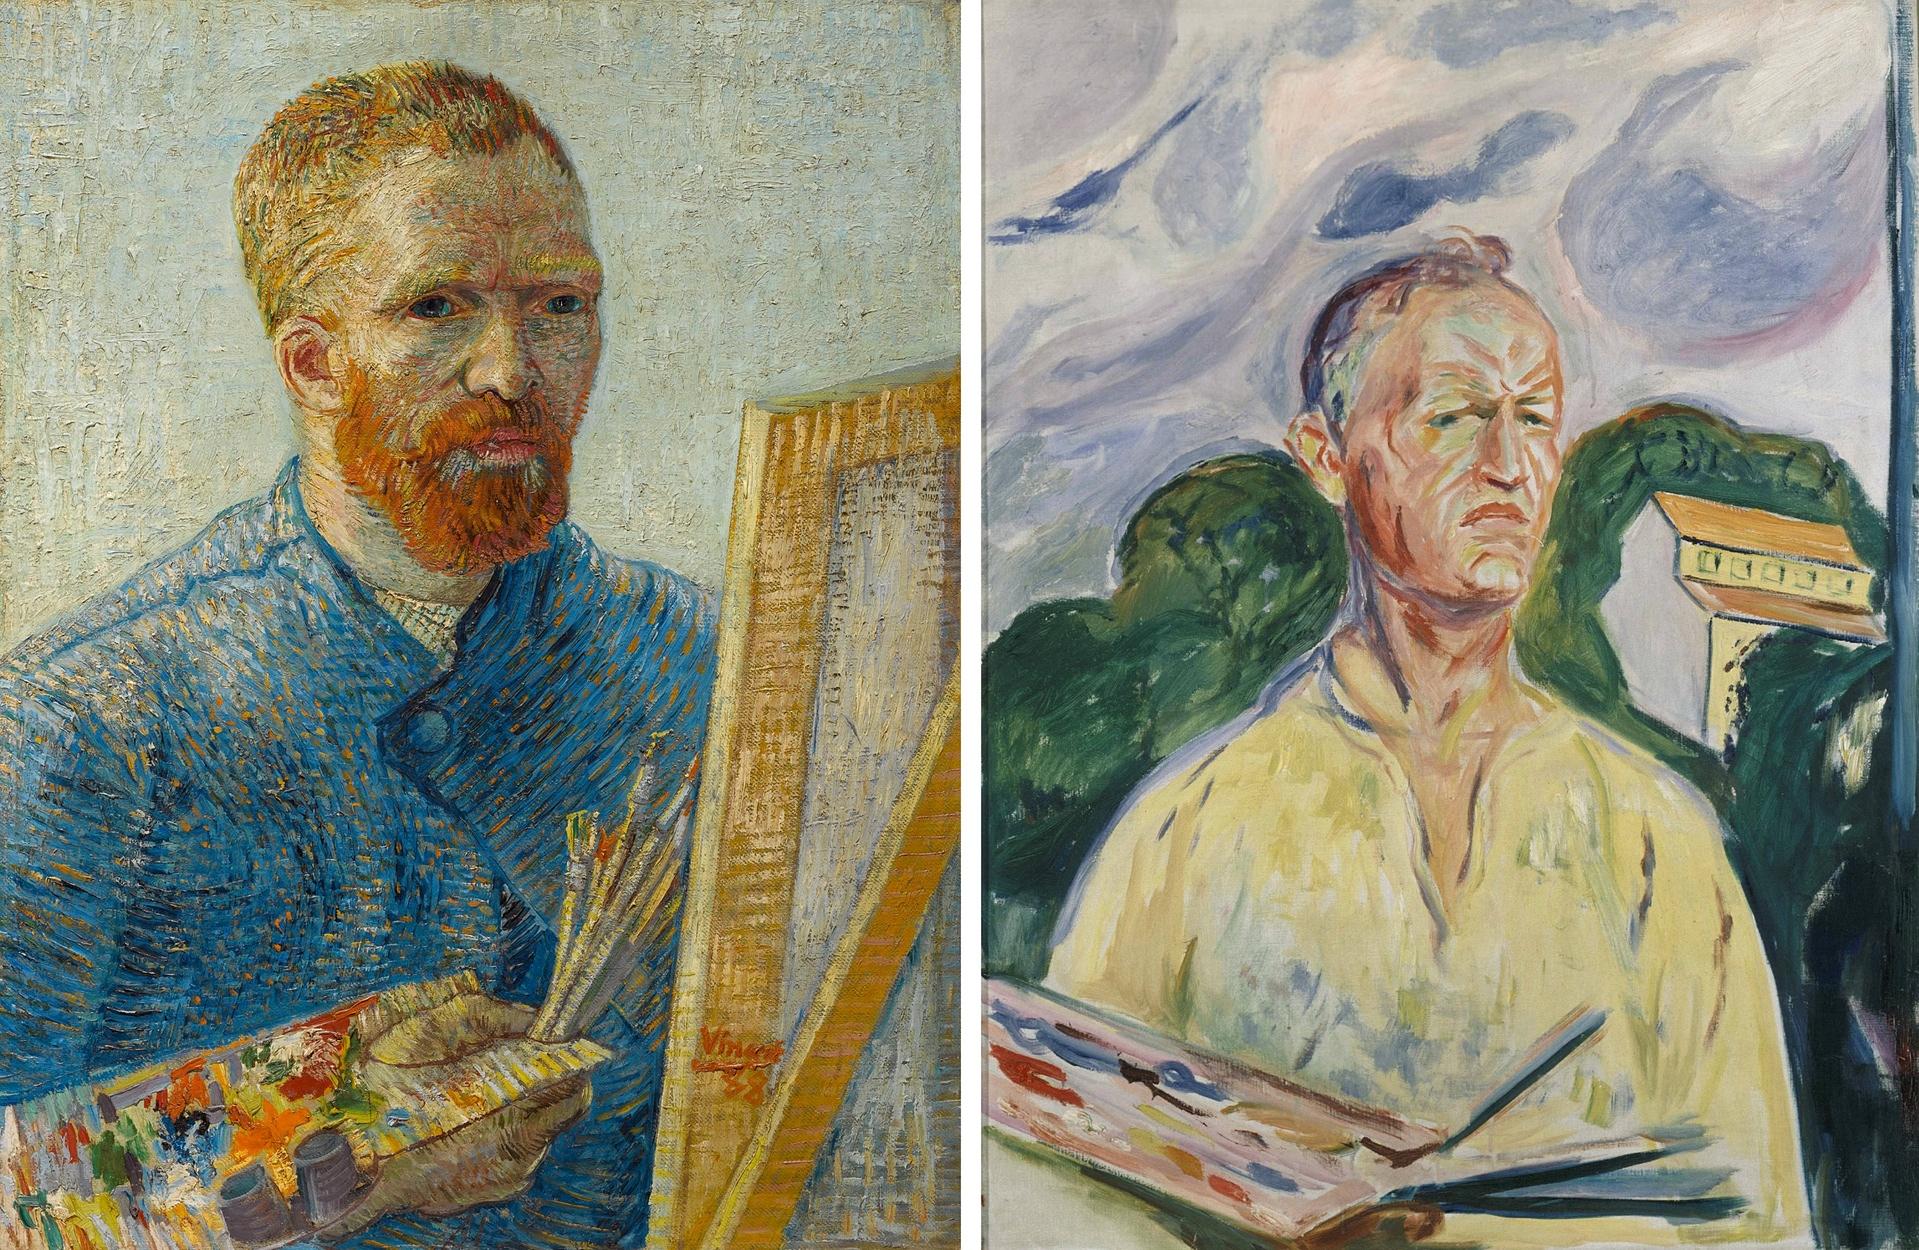 Self-Portrait as a Painter (1887-88) by Vincent van Gogh; and Self-Portrait with Palette (1926) by Edvard Munch. Photograph: Reuters